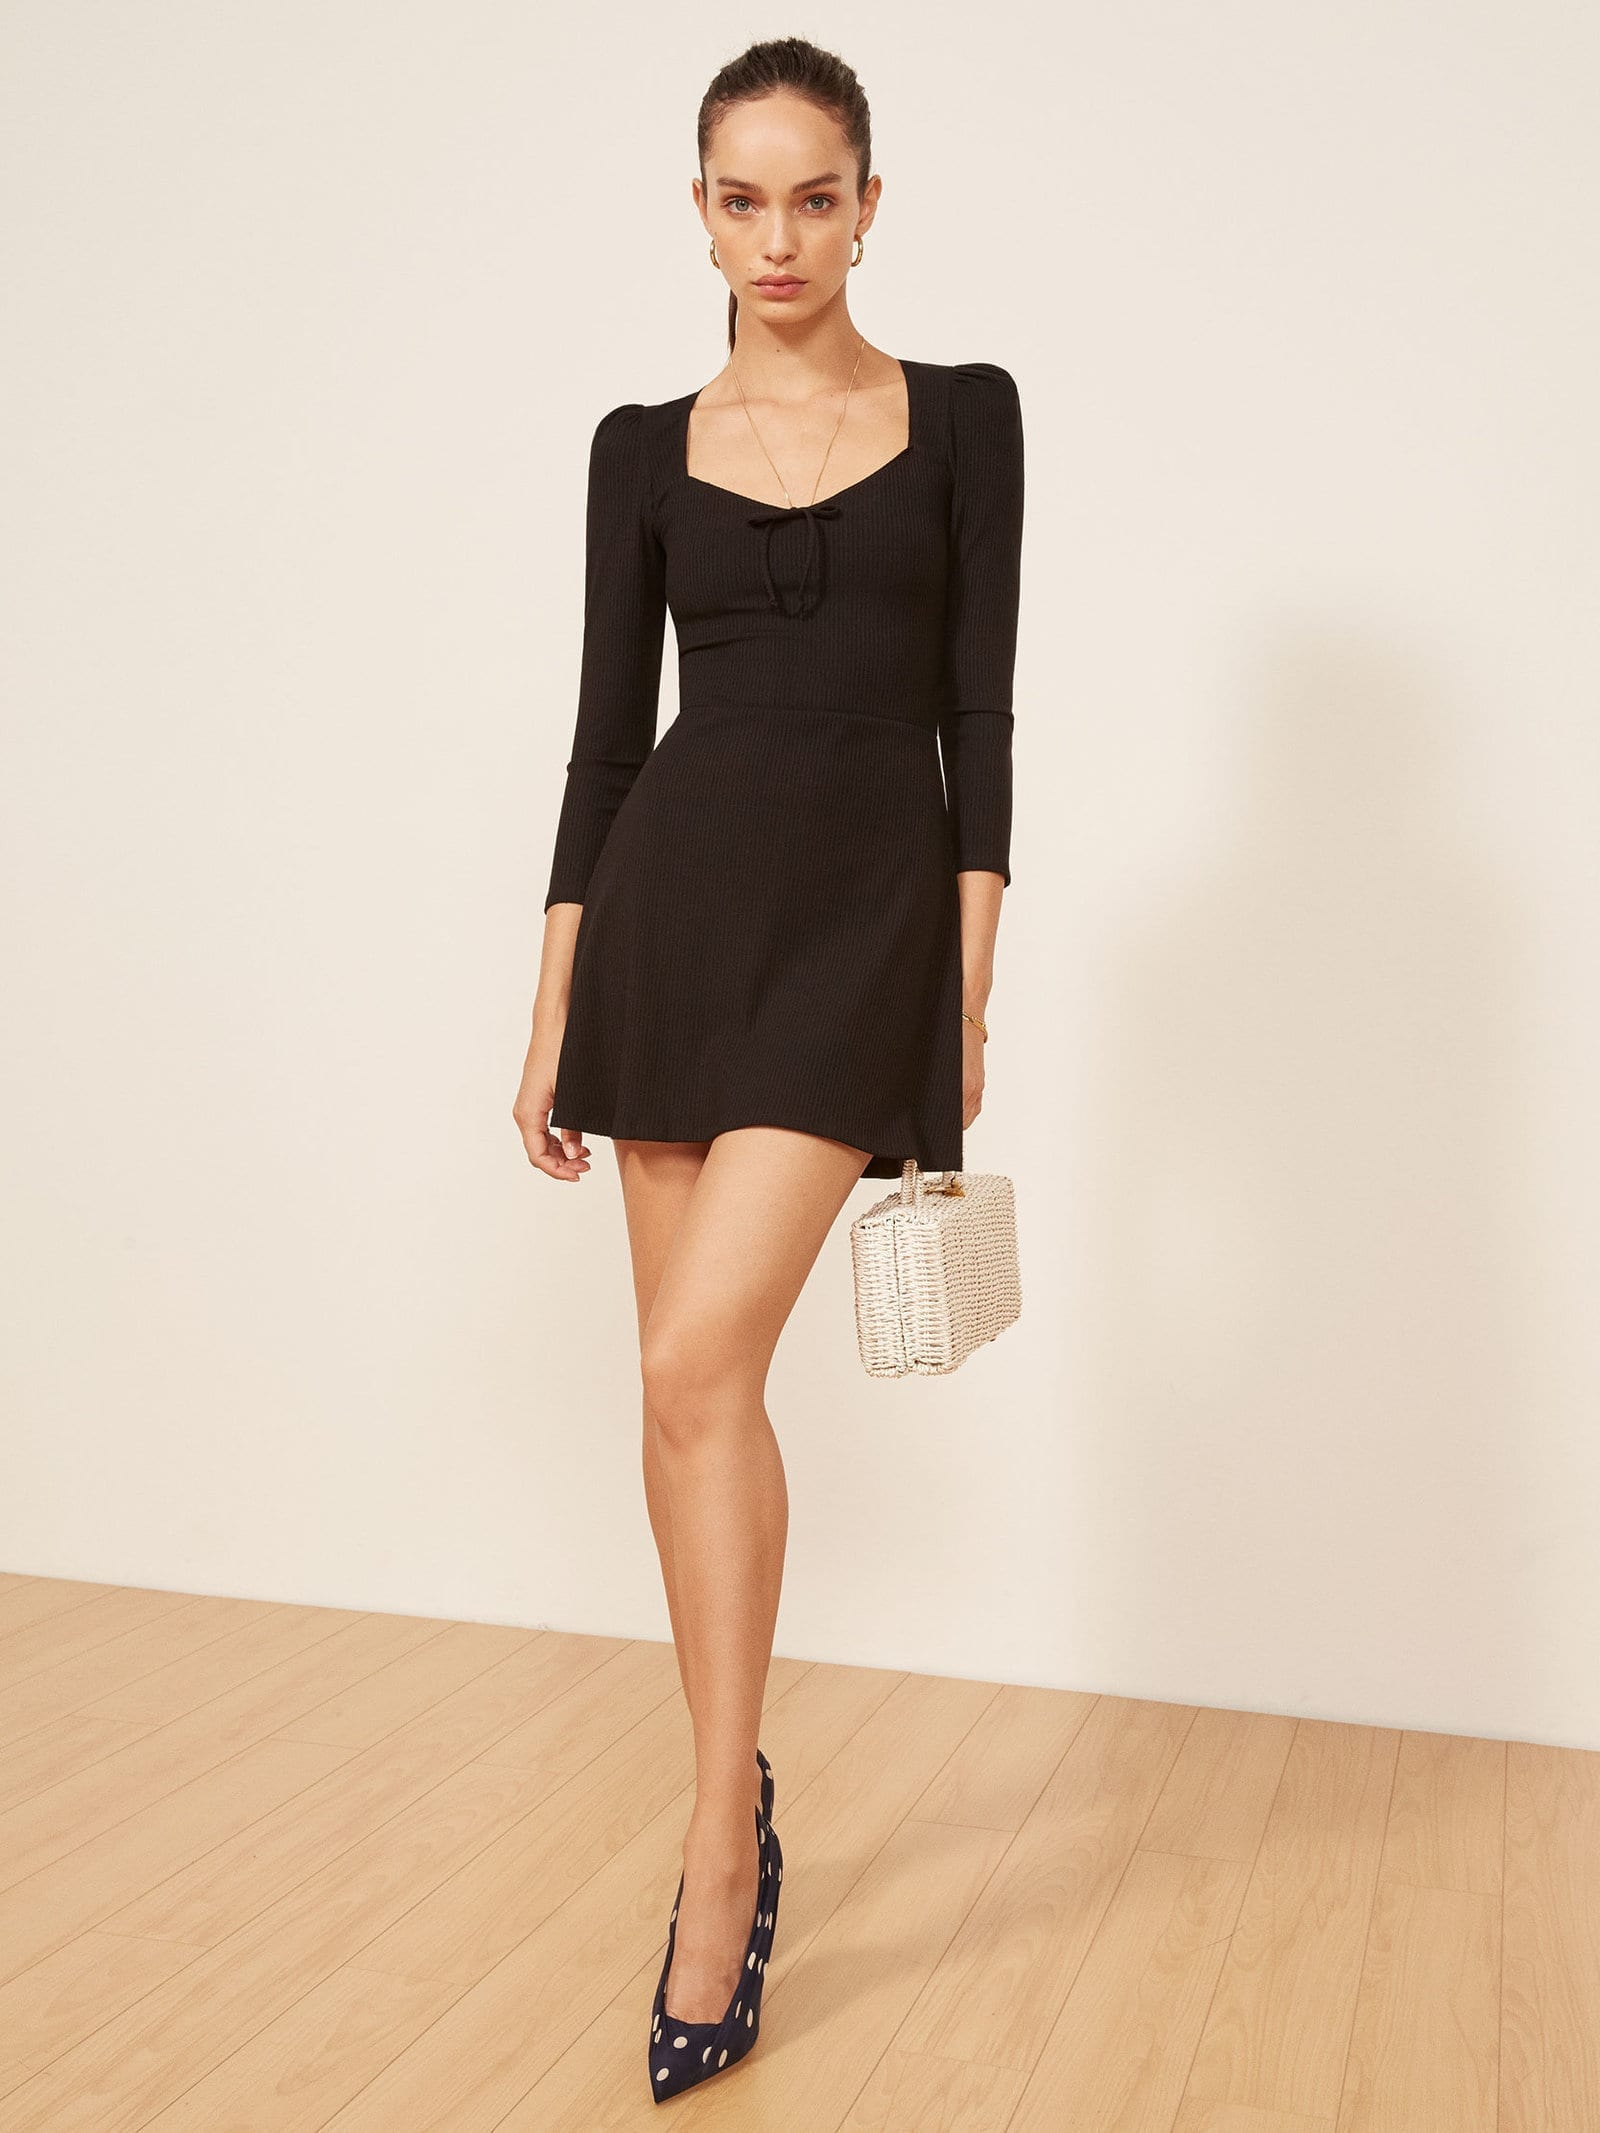 THEREFORMATION Annabella Black Dress